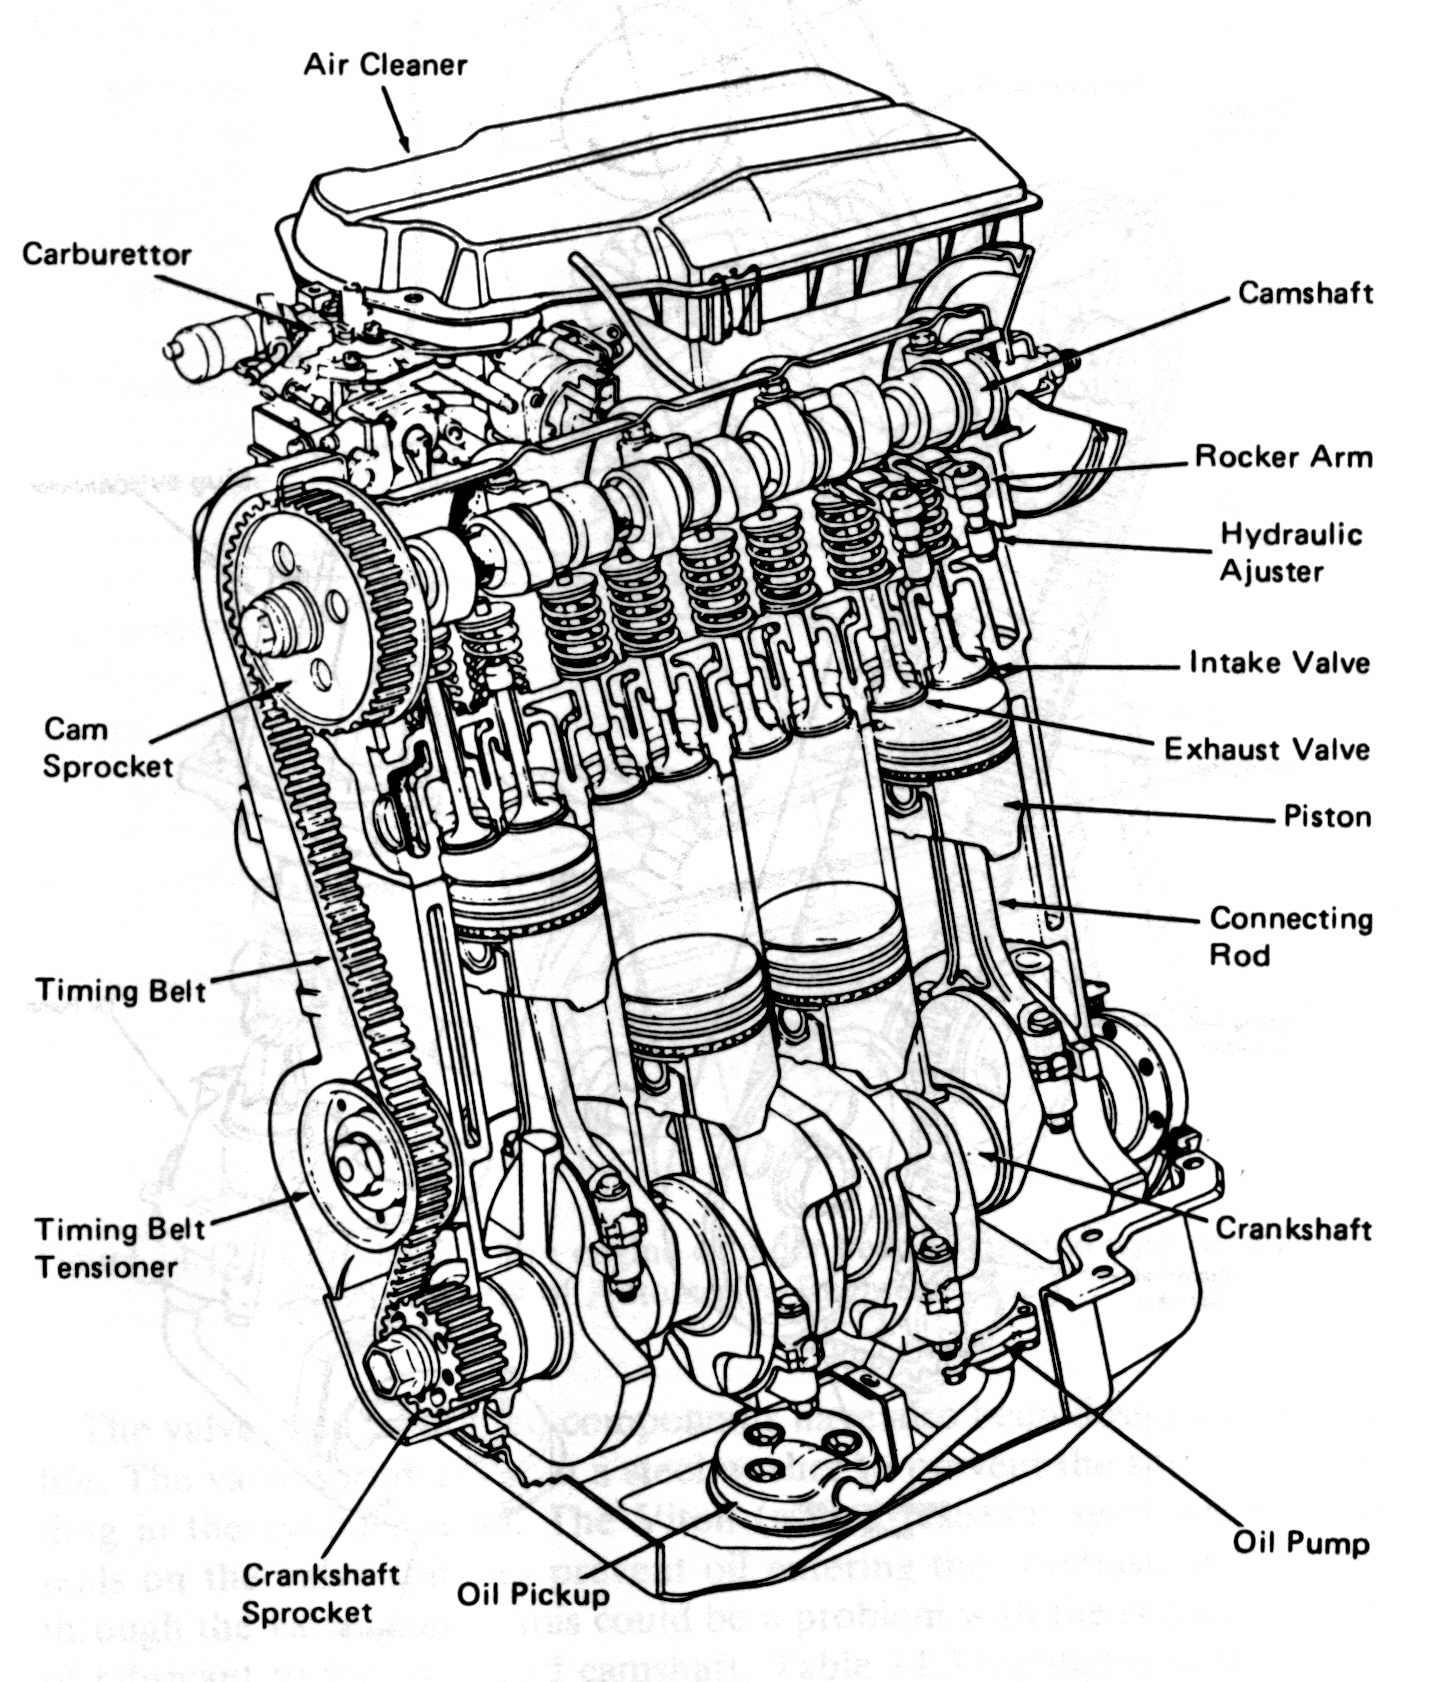 Car engine diagram for dummies amazing diesel engine diagram labeled